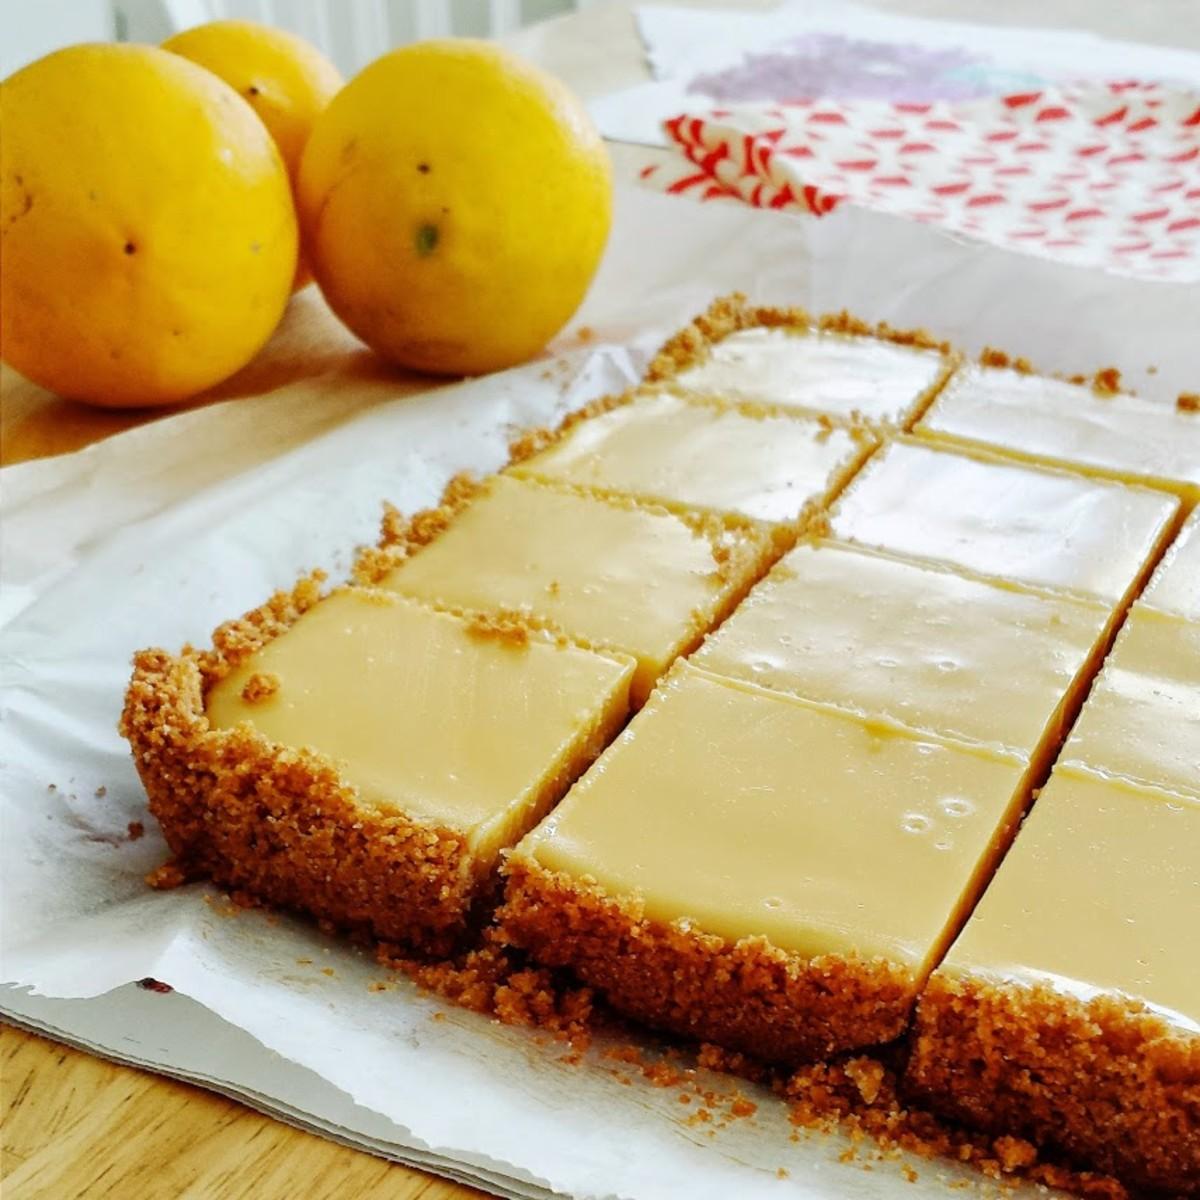 Easy Lime Tart with Pistachio Graham Cracker Crust